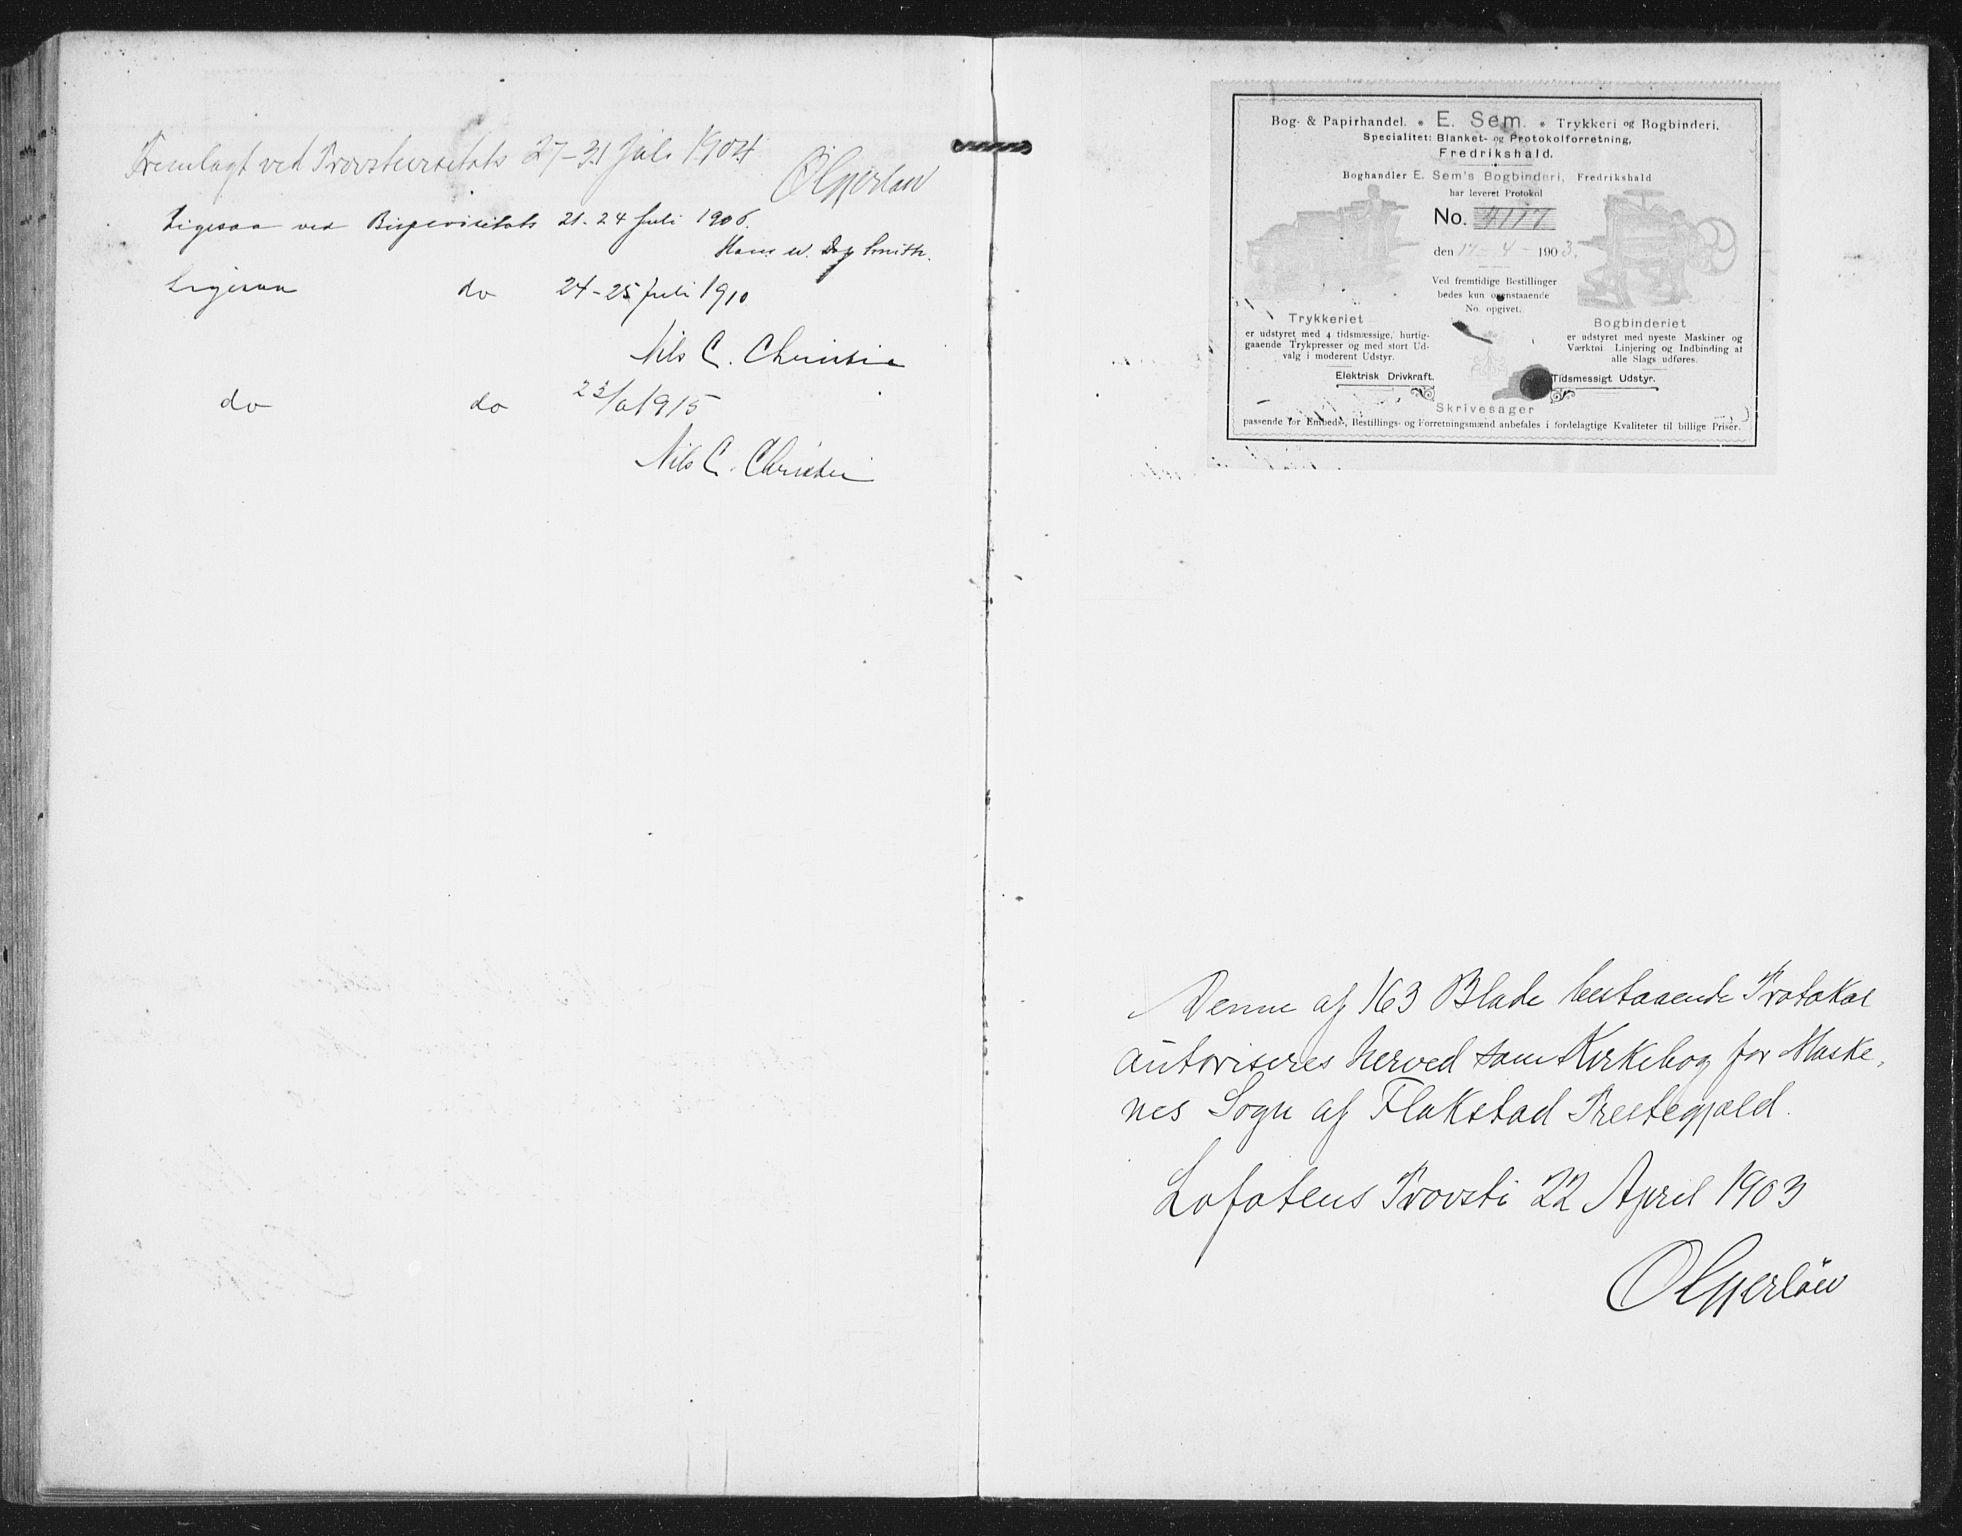 SAT, Ministerialprotokoller, klokkerbøker og fødselsregistre - Nordland, 886/L1221: Ministerialbok nr. 886A03, 1903-1913